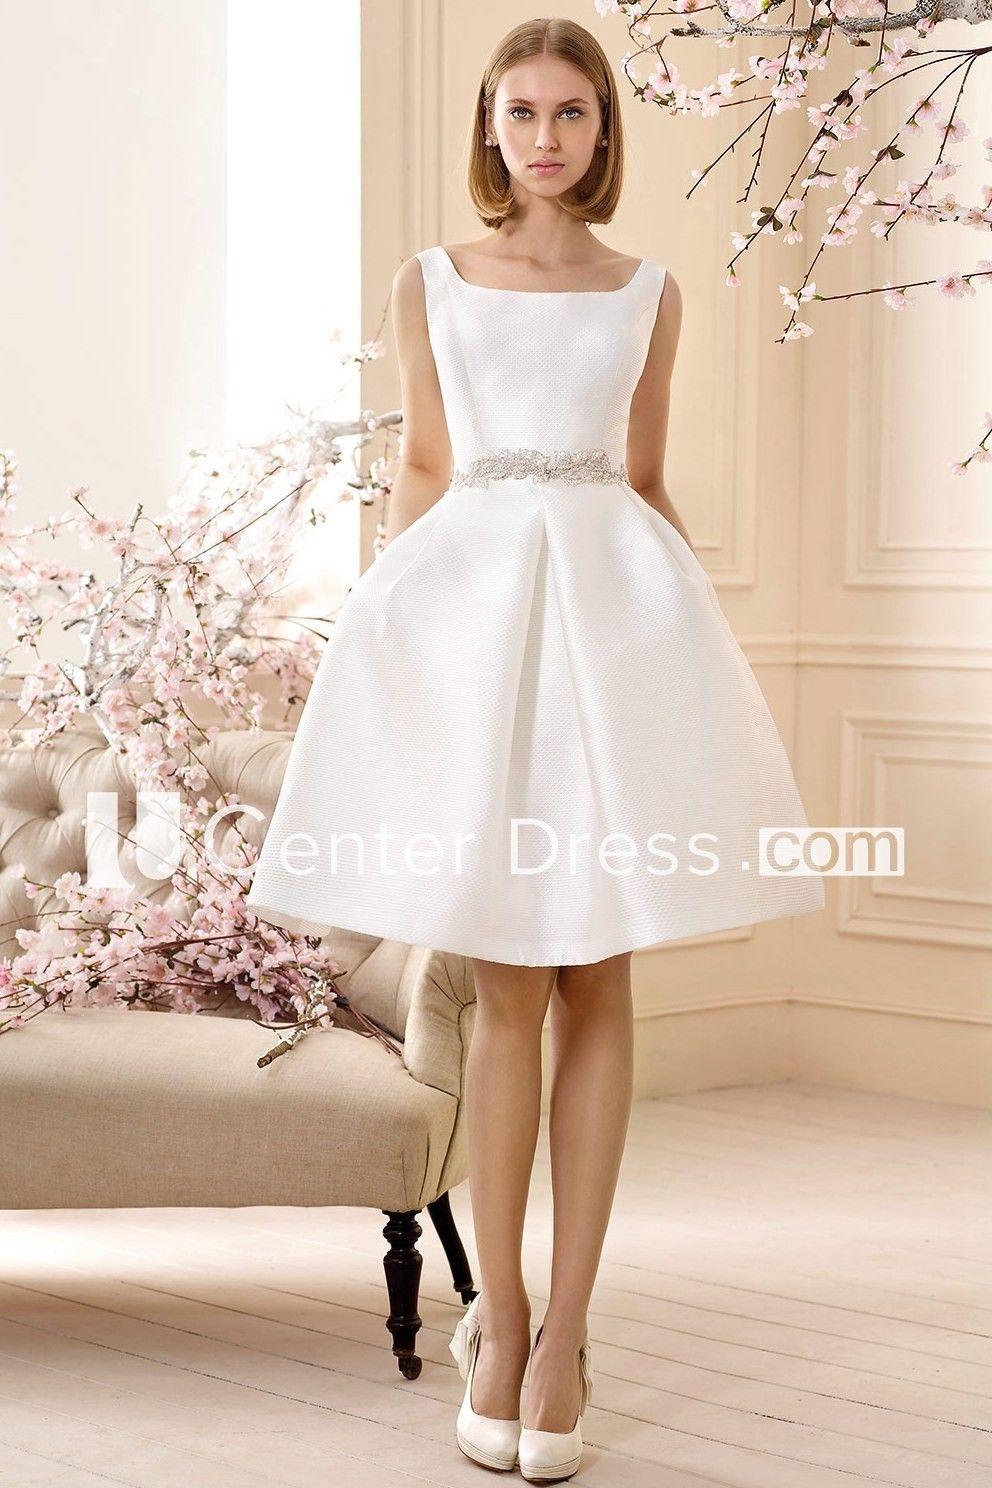 63badf82d7 A Line Jeweled Sleeveless Short Mini Square Neck Satin Wedding Dress ...